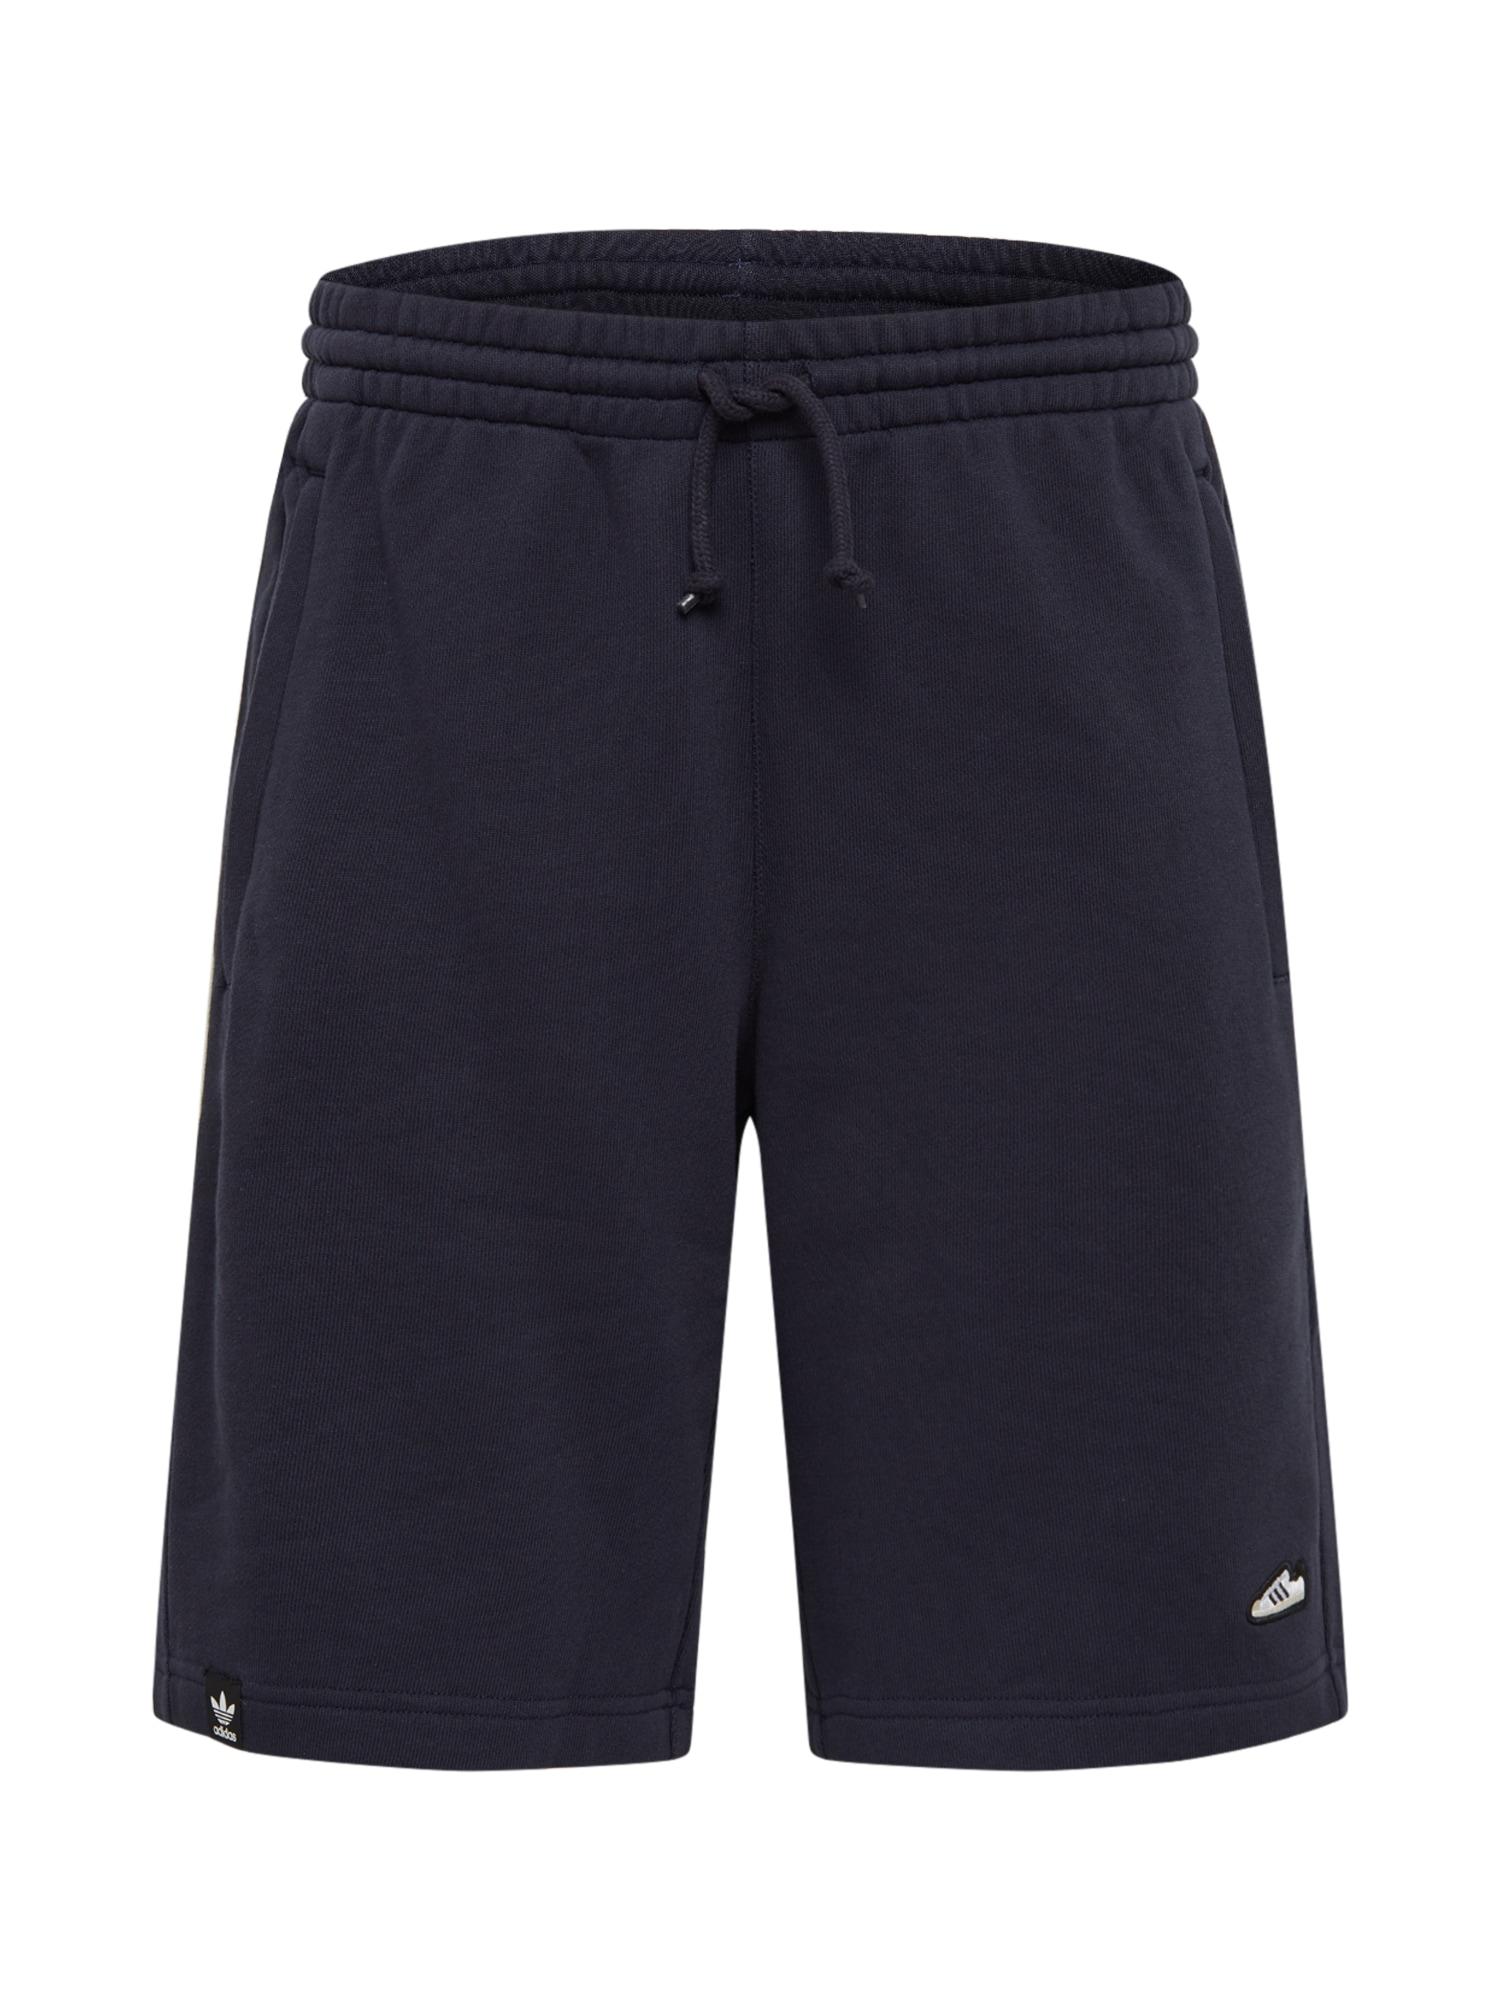 ADIDAS ORIGINALS Sportinės kelnės 'SST EMB' mėlyna